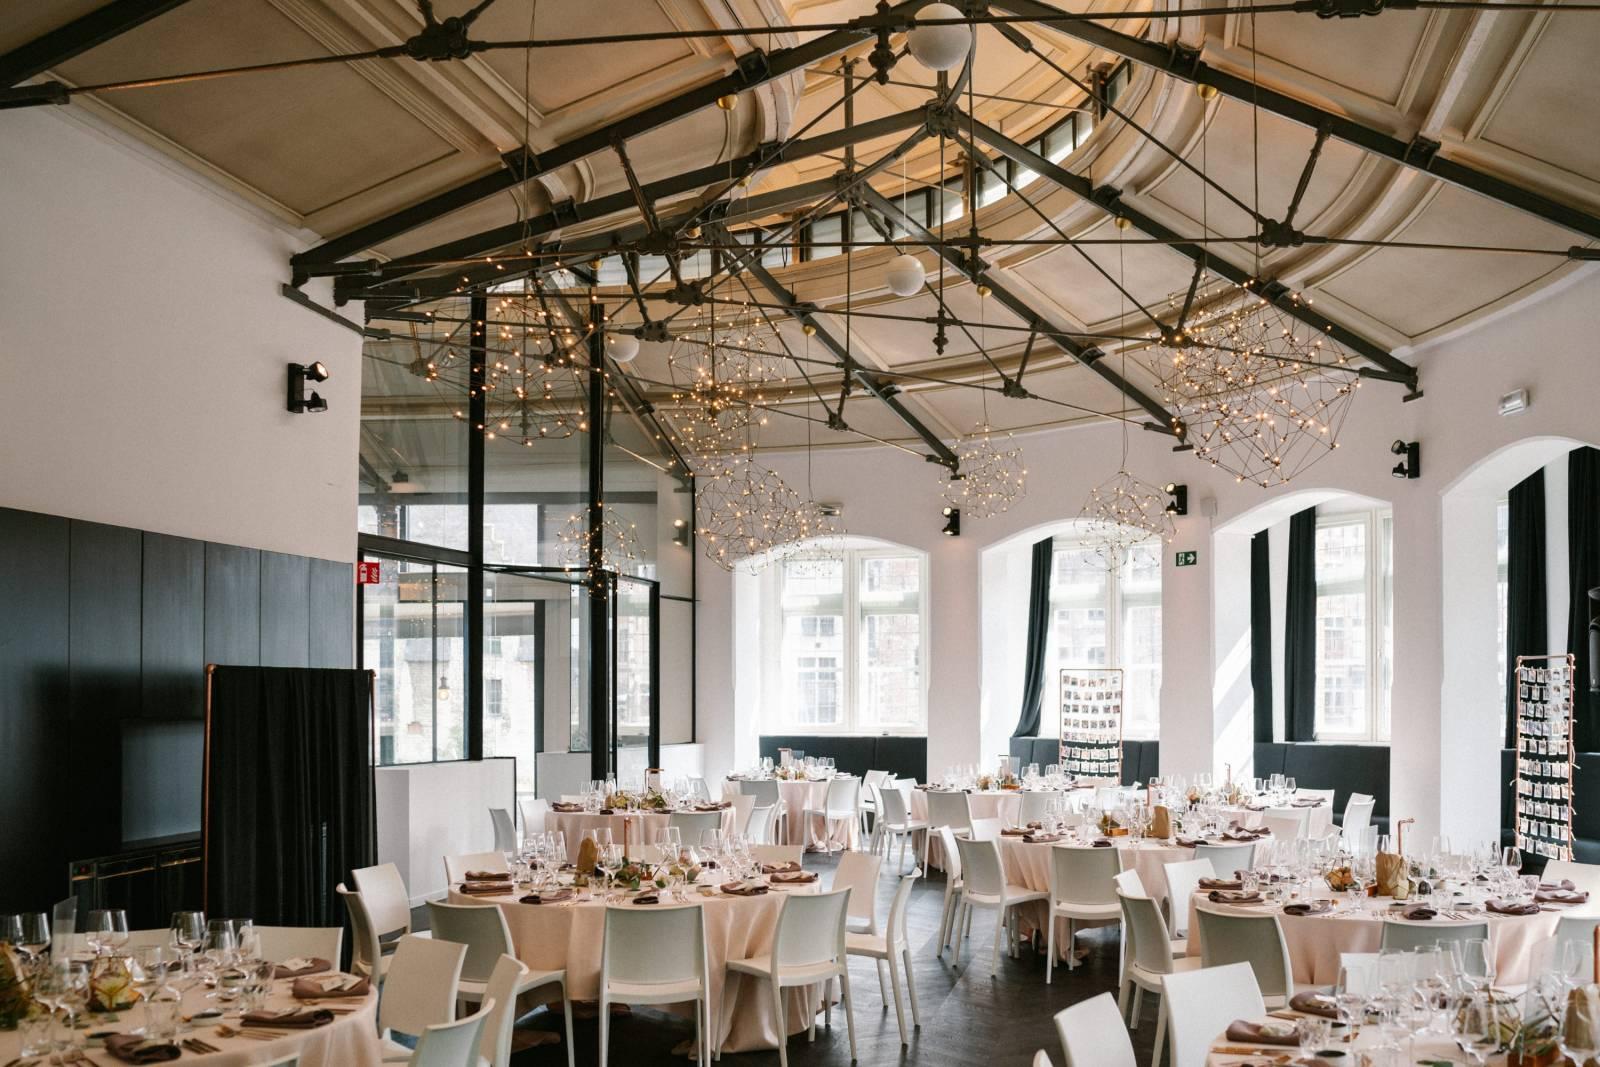 Elegant Events - Weddingplanner - Fotograaf Tom Leuntjens Photography - House of Weddings (6)